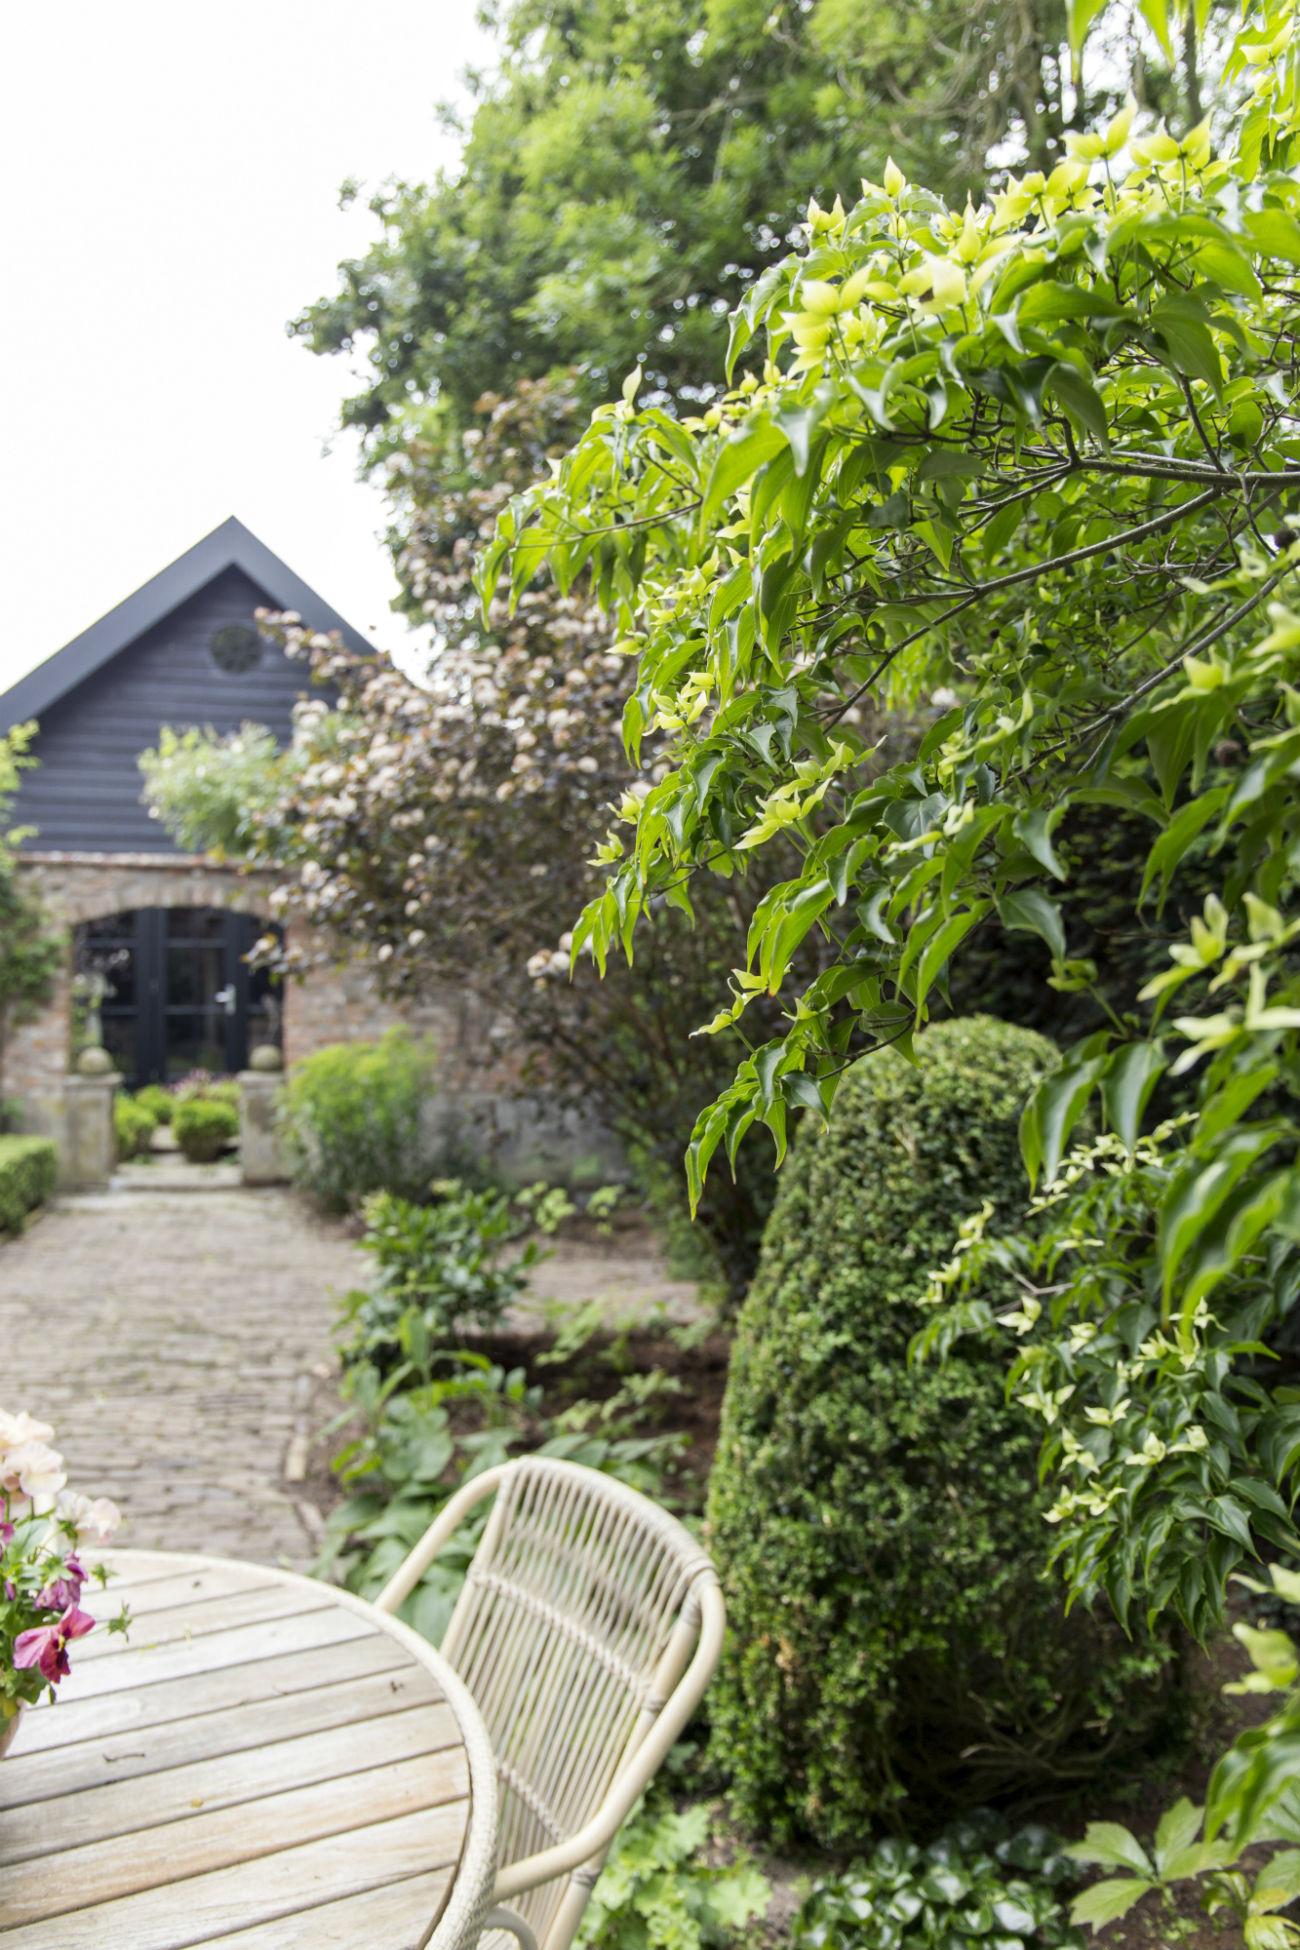 Tuinontwerp-tuinontwerper-Toffe Tuinen-tuinaanleg-tuinadvies-tuinarchitect